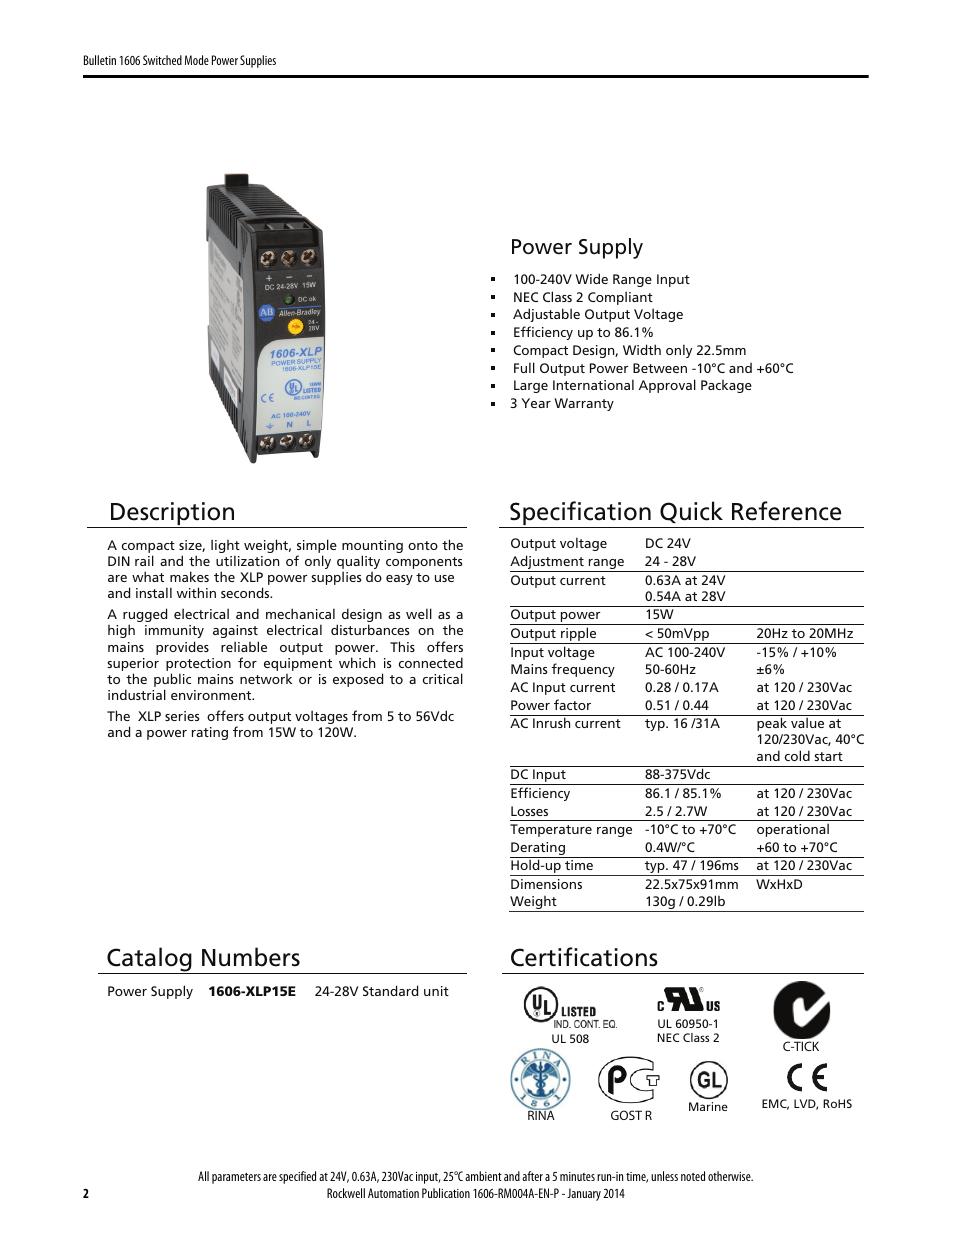 Description, Specification quick reference, Catalog ...